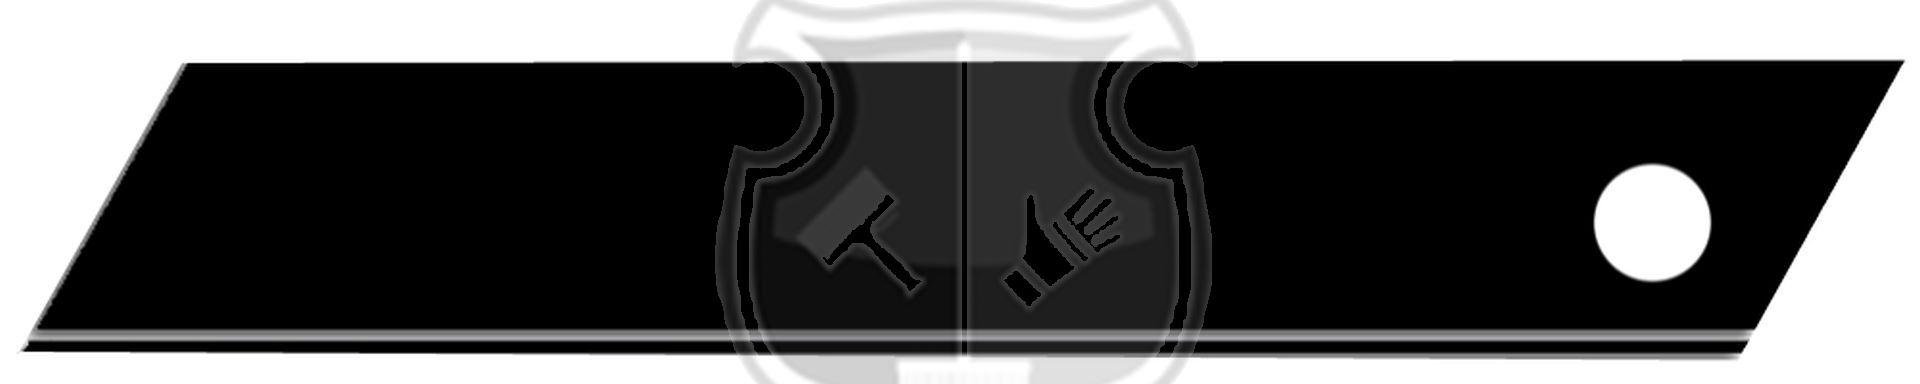 styropor reservemes veiligheidsmes 18mm carel lurvink professionele schoonmaakartikelen. Black Bedroom Furniture Sets. Home Design Ideas